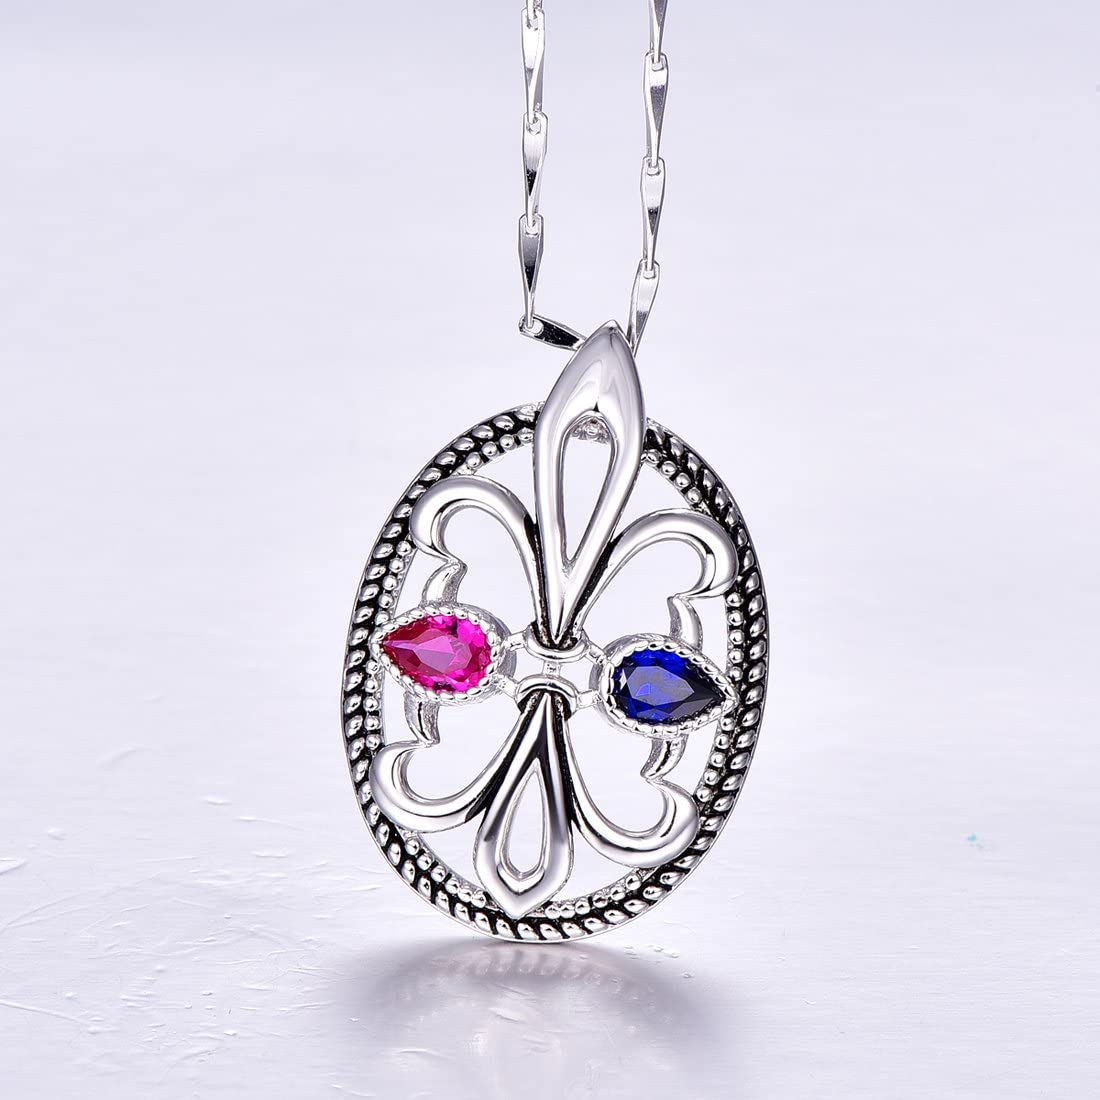 Auzeuner Women Vintage Bohemian Anchor Charm 925 Sterling Silver Pendant Necklace 18 inch Chain